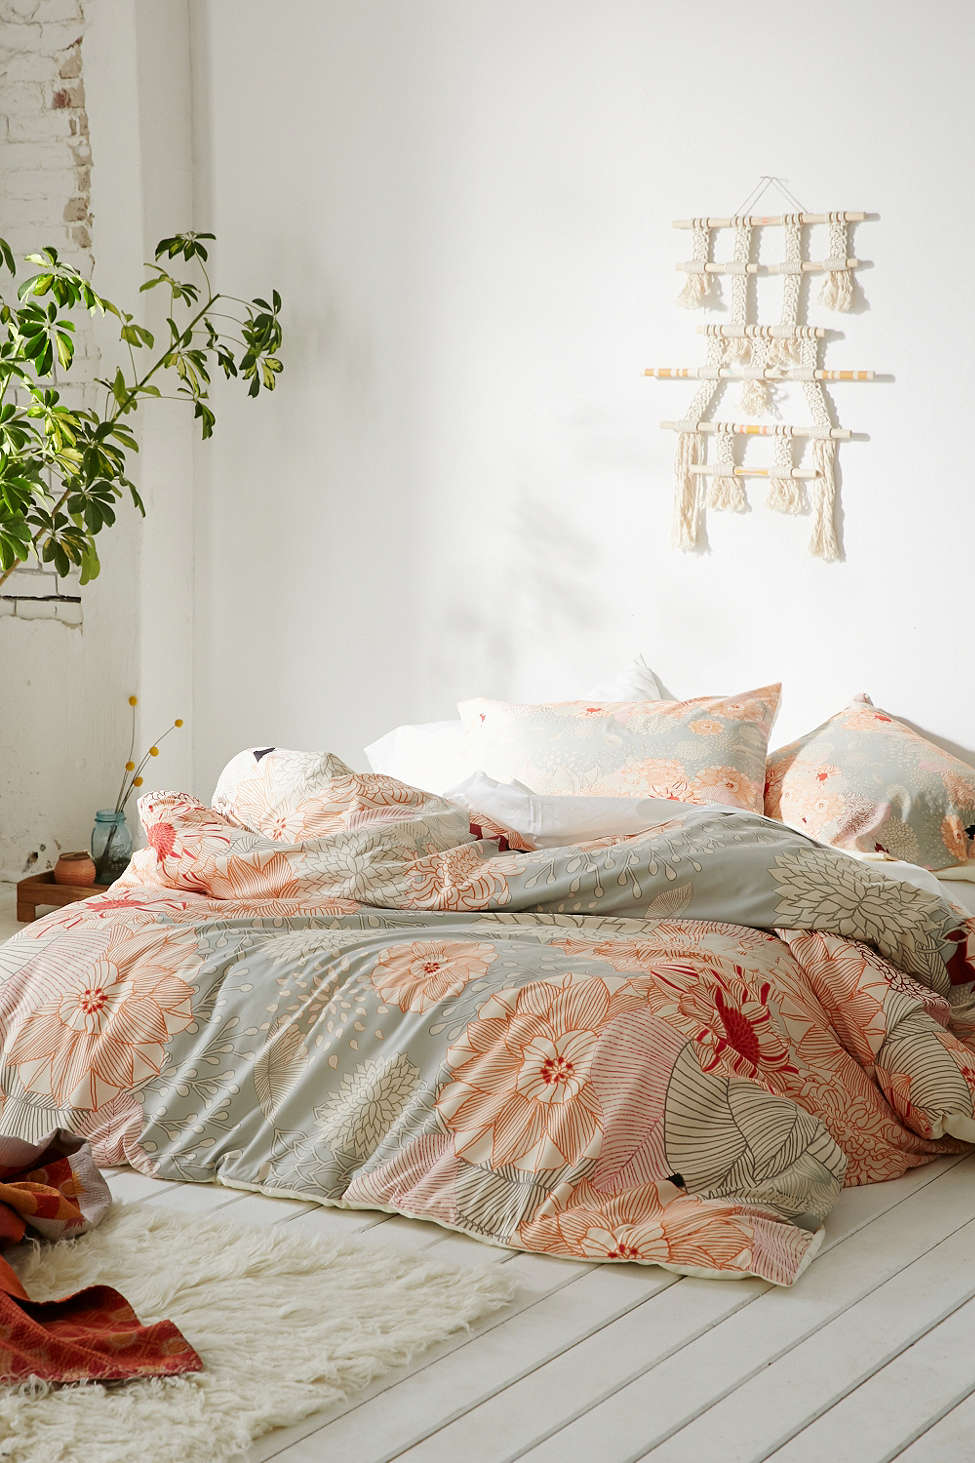 Iveta Abolina For DENY Creme De La Creme Duvet Cover - Urban Outfitters